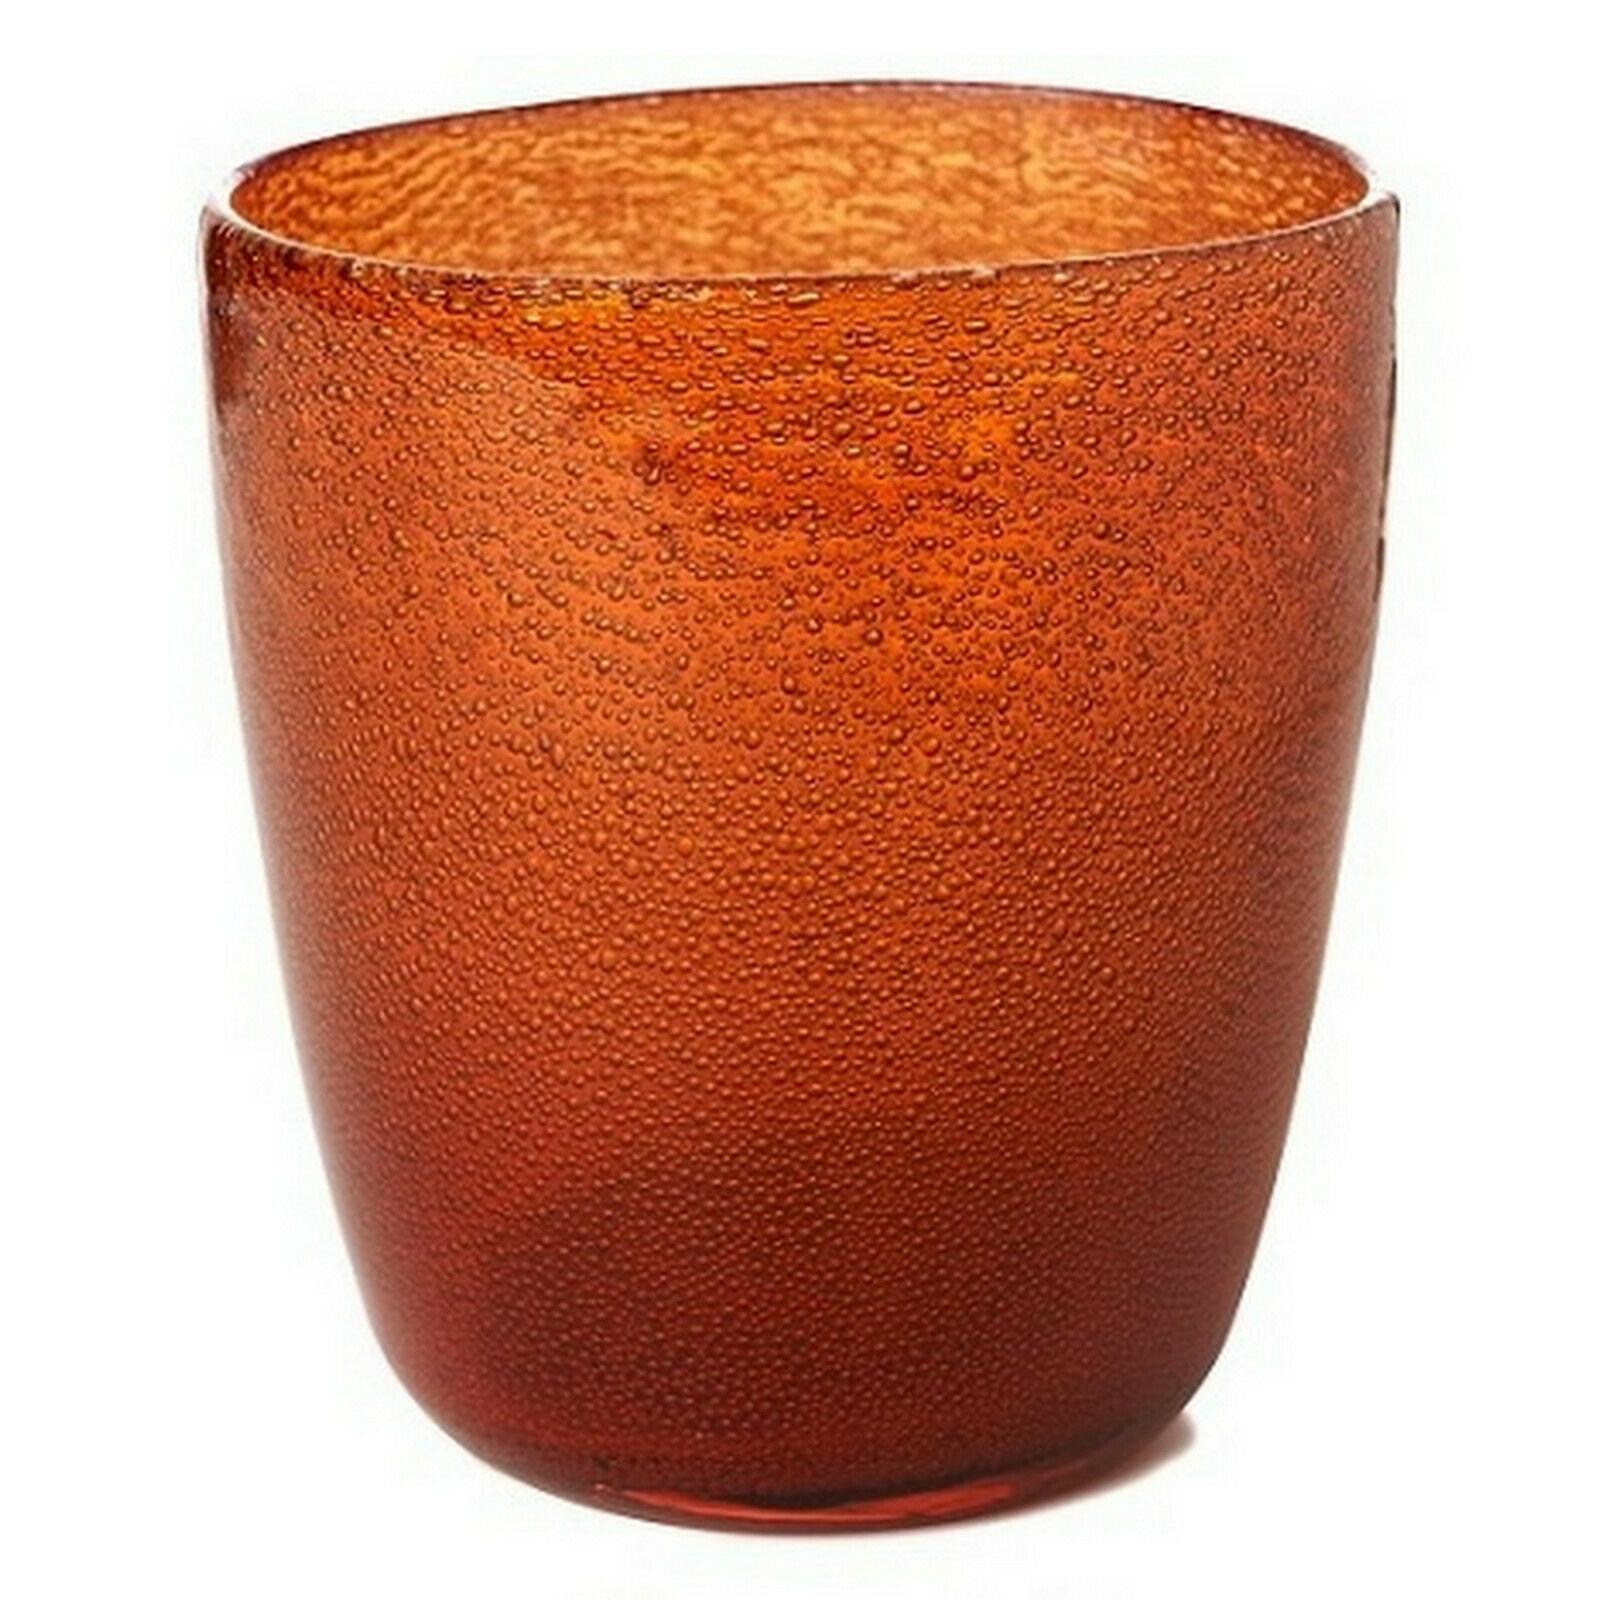 4-12 Duni Kerzenhalter Teelichthalter 105x90 mm Kerzenglas Raindrops Mandarin - 12 Stück